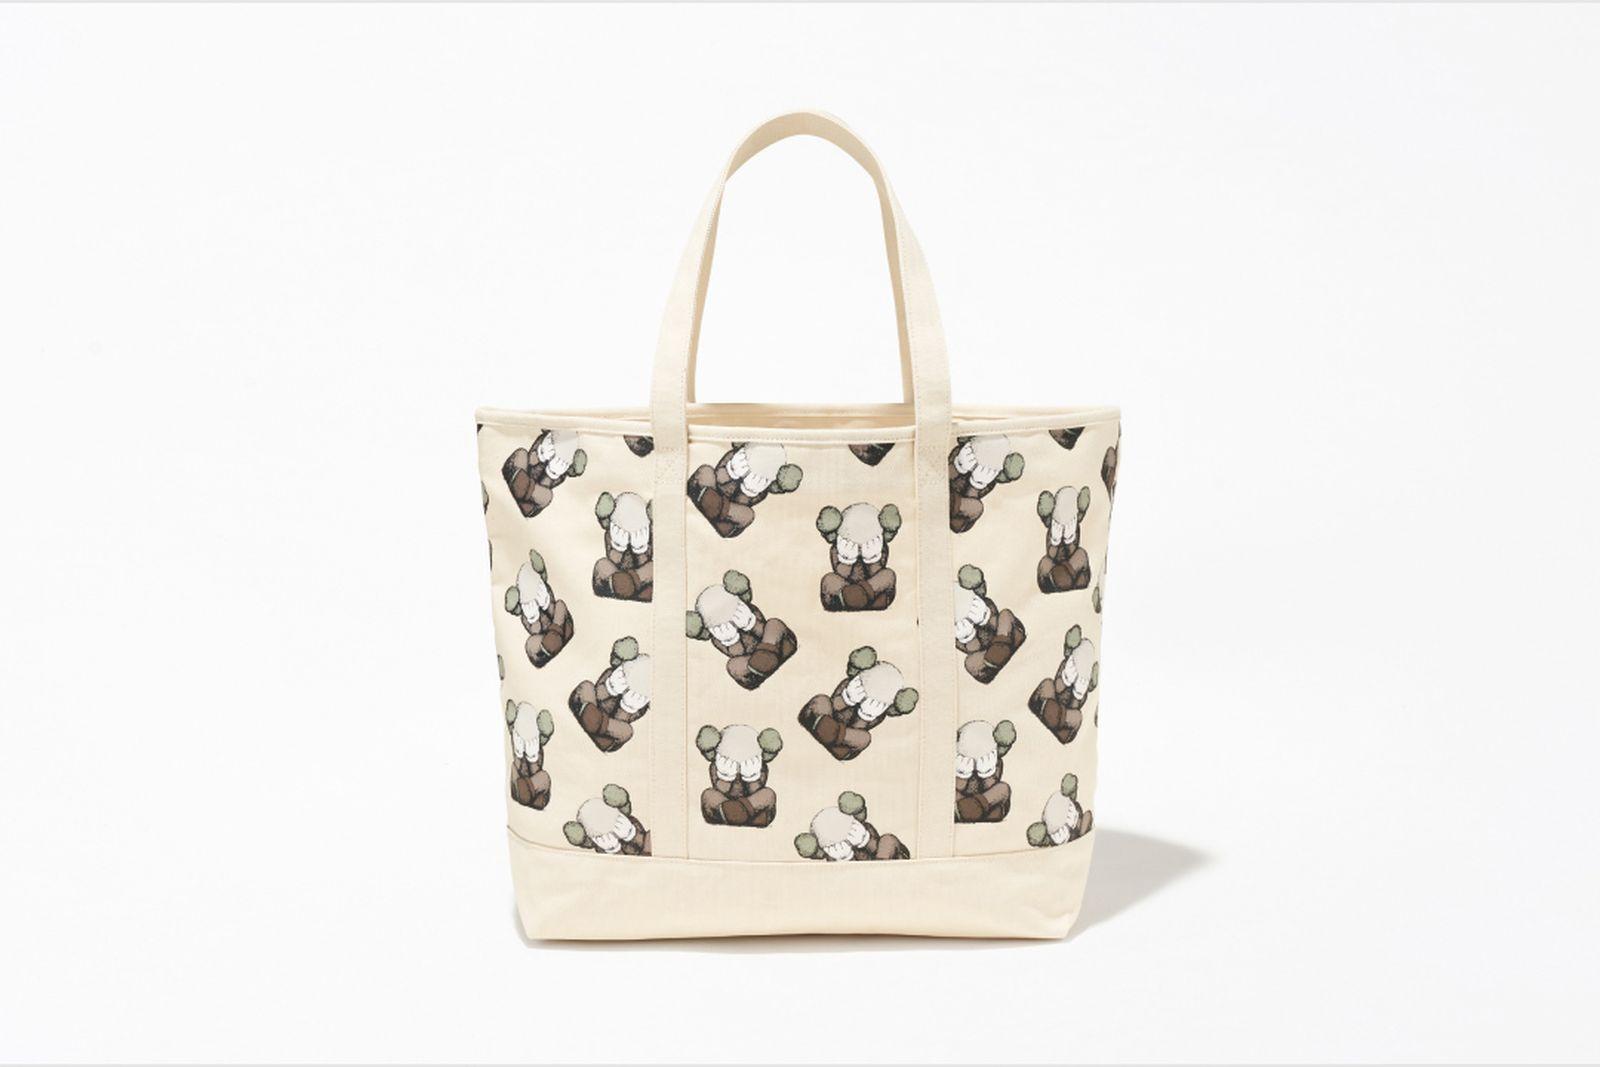 kaws tokyo first uniqlo ut companion tee shirt buy release date info bag